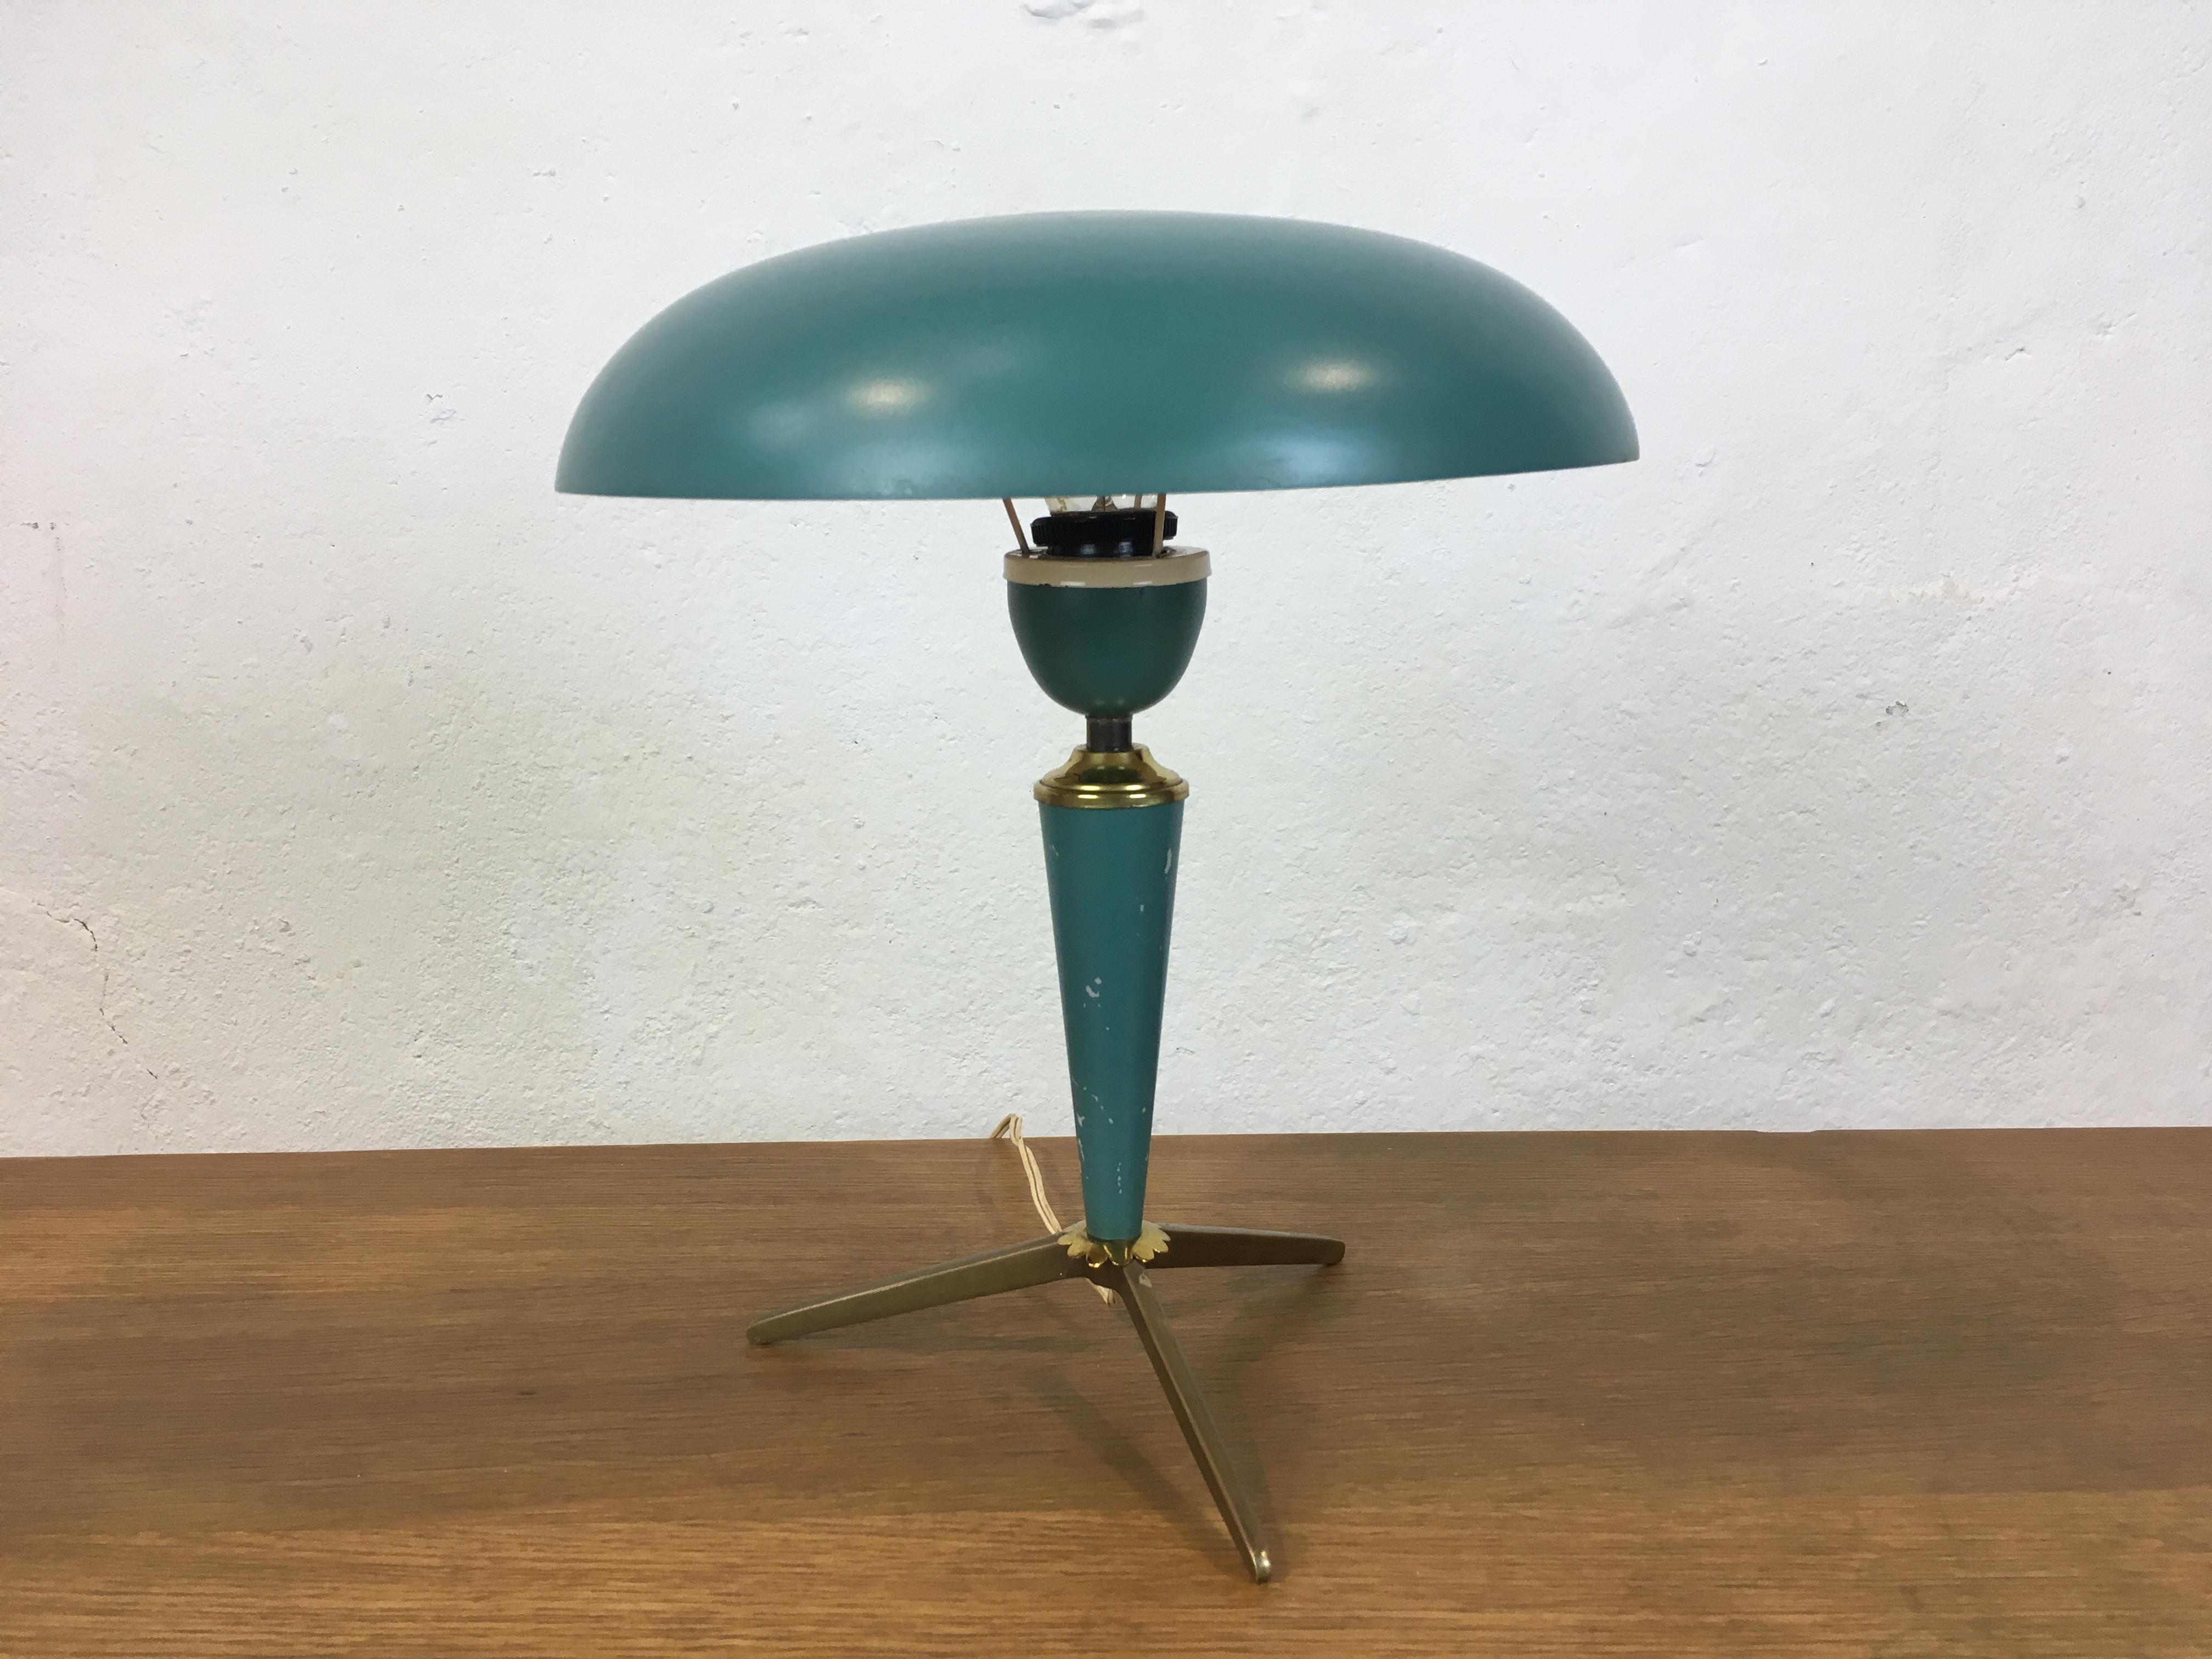 lampe de table louis kalff philips ann e 50 desk lamp philips kalff 1950 s. Black Bedroom Furniture Sets. Home Design Ideas